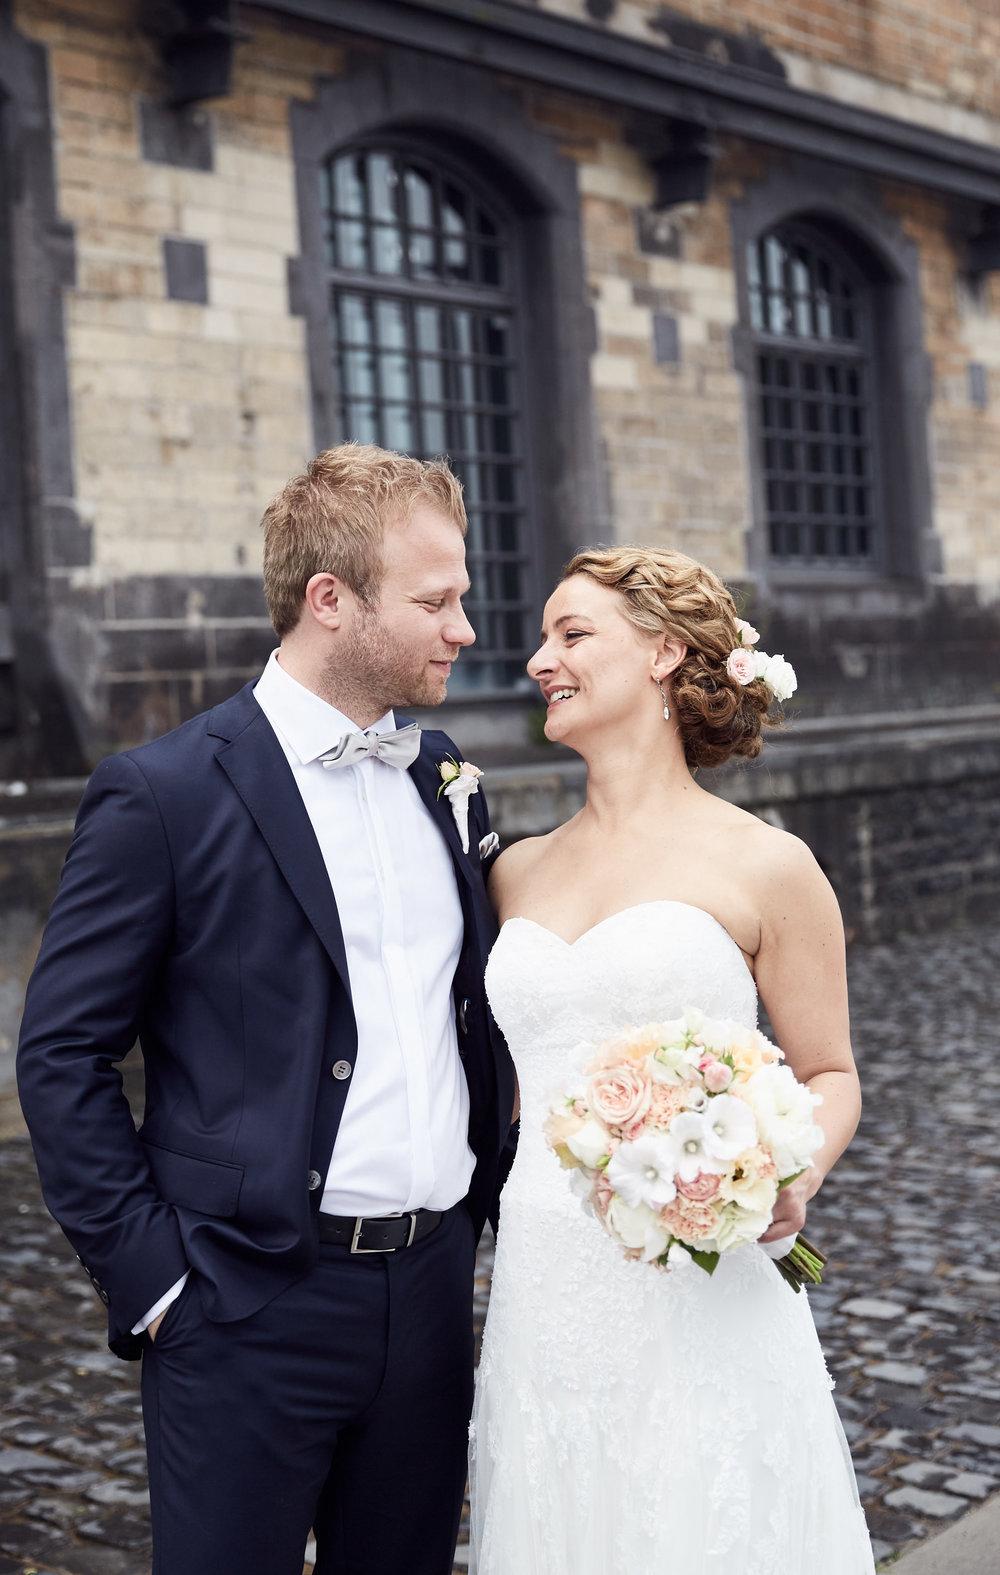 Lars Heinicke Photography_Hochzeitsfotograf-Berlin Fotograf Berlin_CB_038.jpg